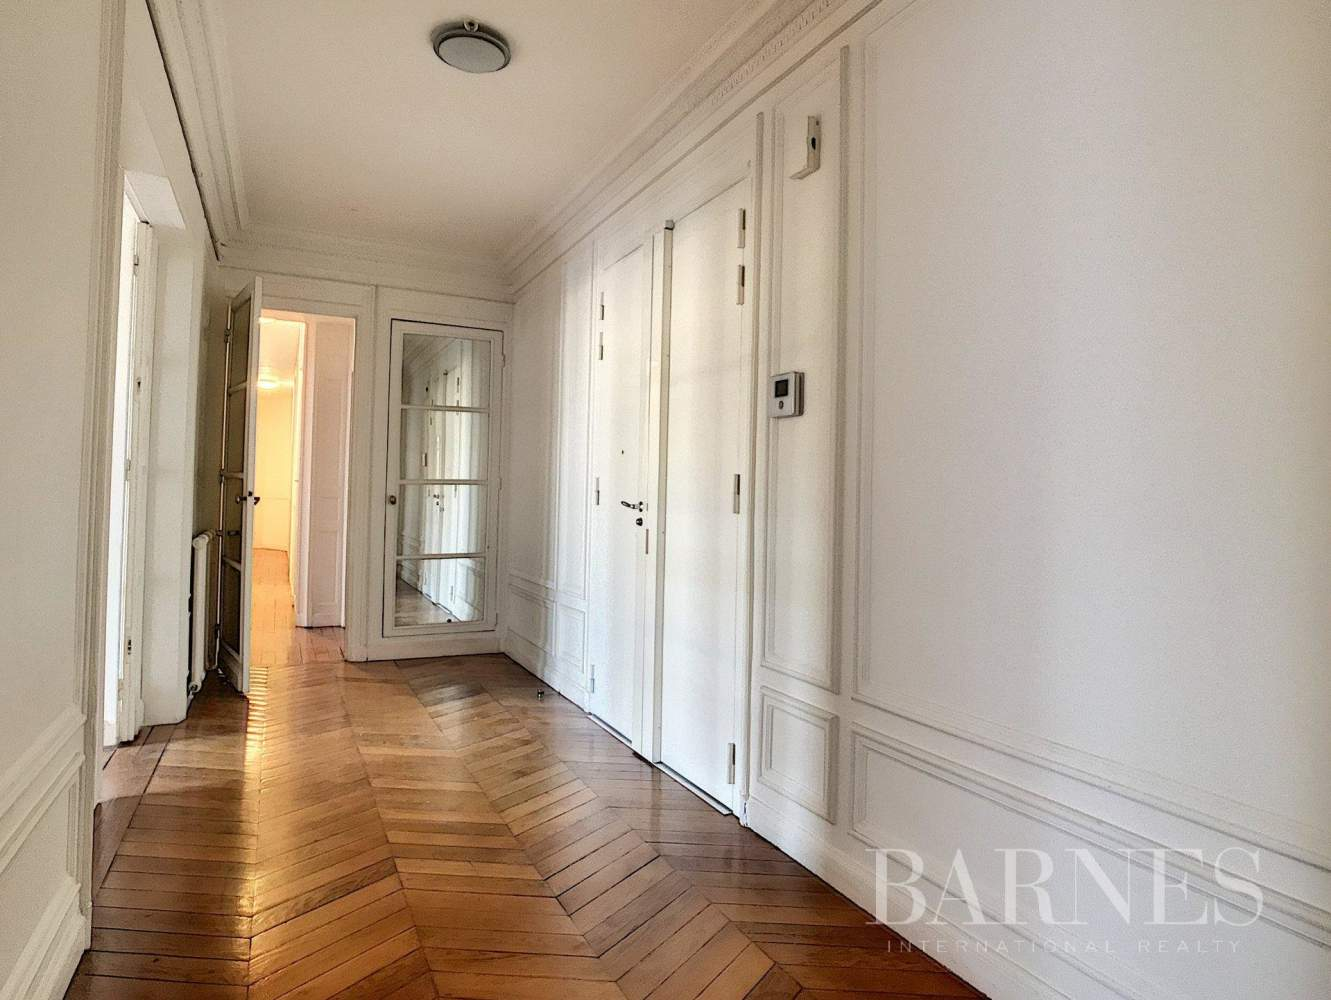 Neuilly-sur-Seine  - Appartement 5 Pièces - picture 7